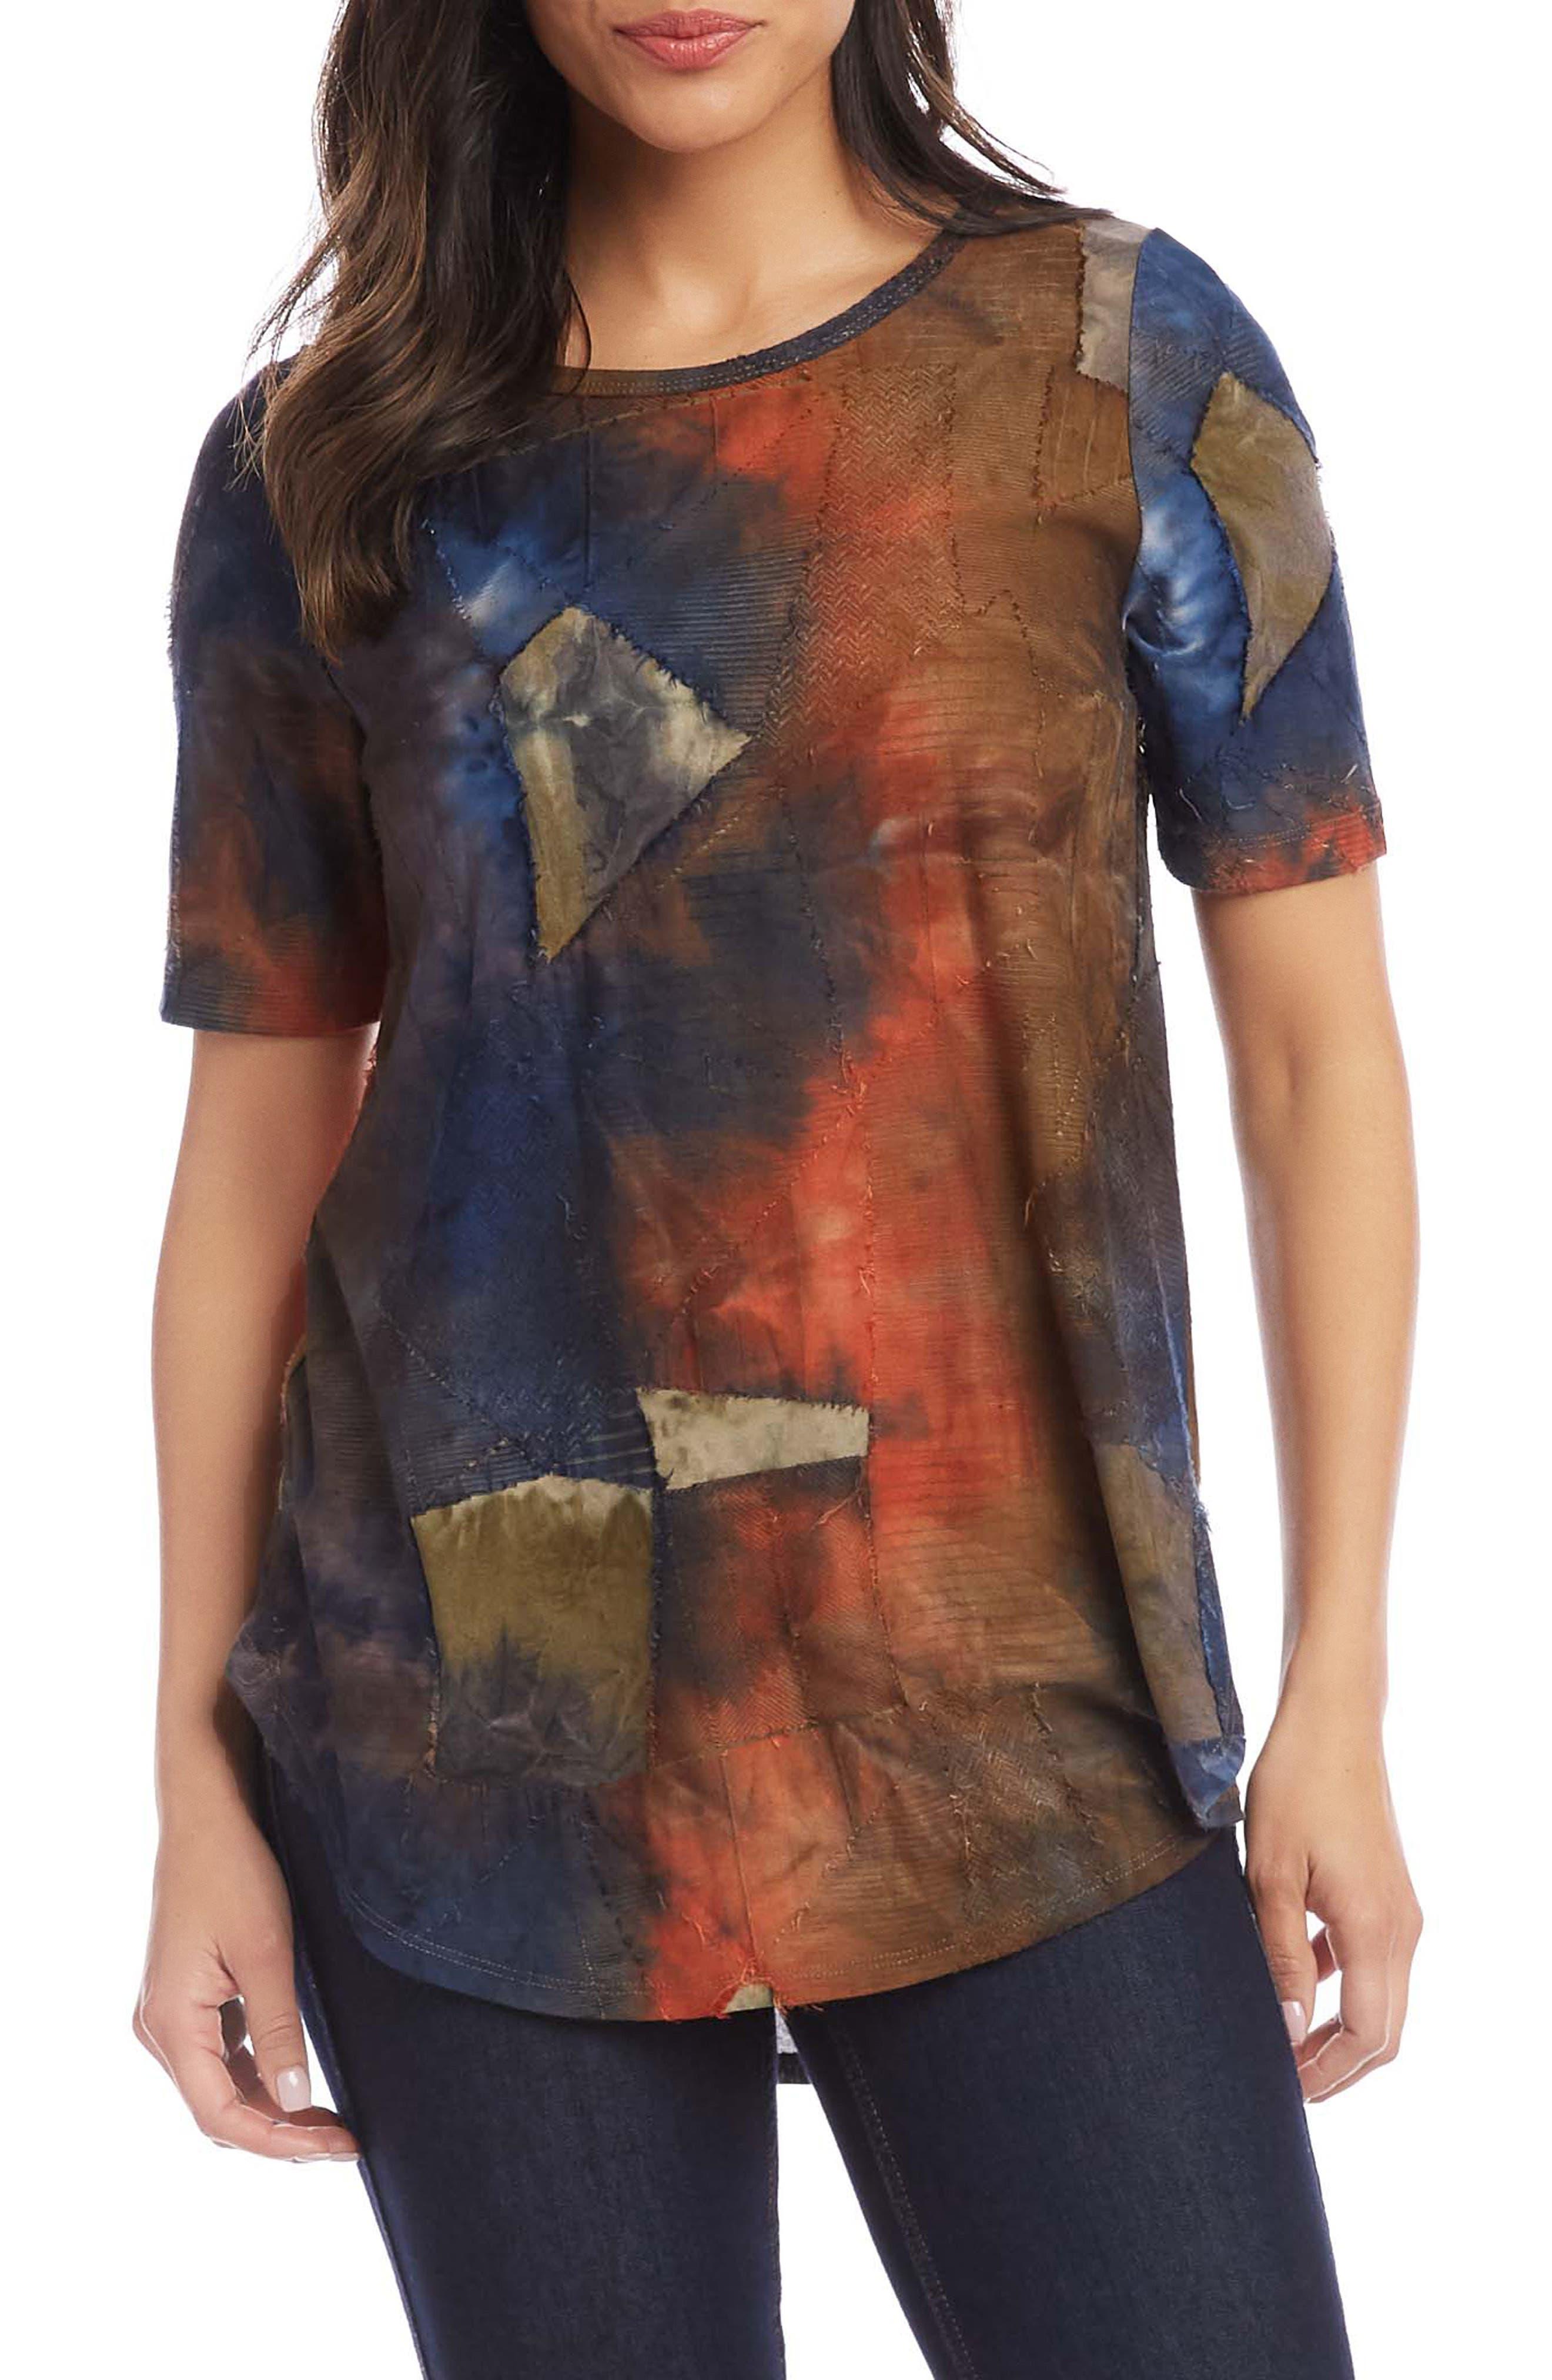 Patchwork Tie Dye T-Shirt